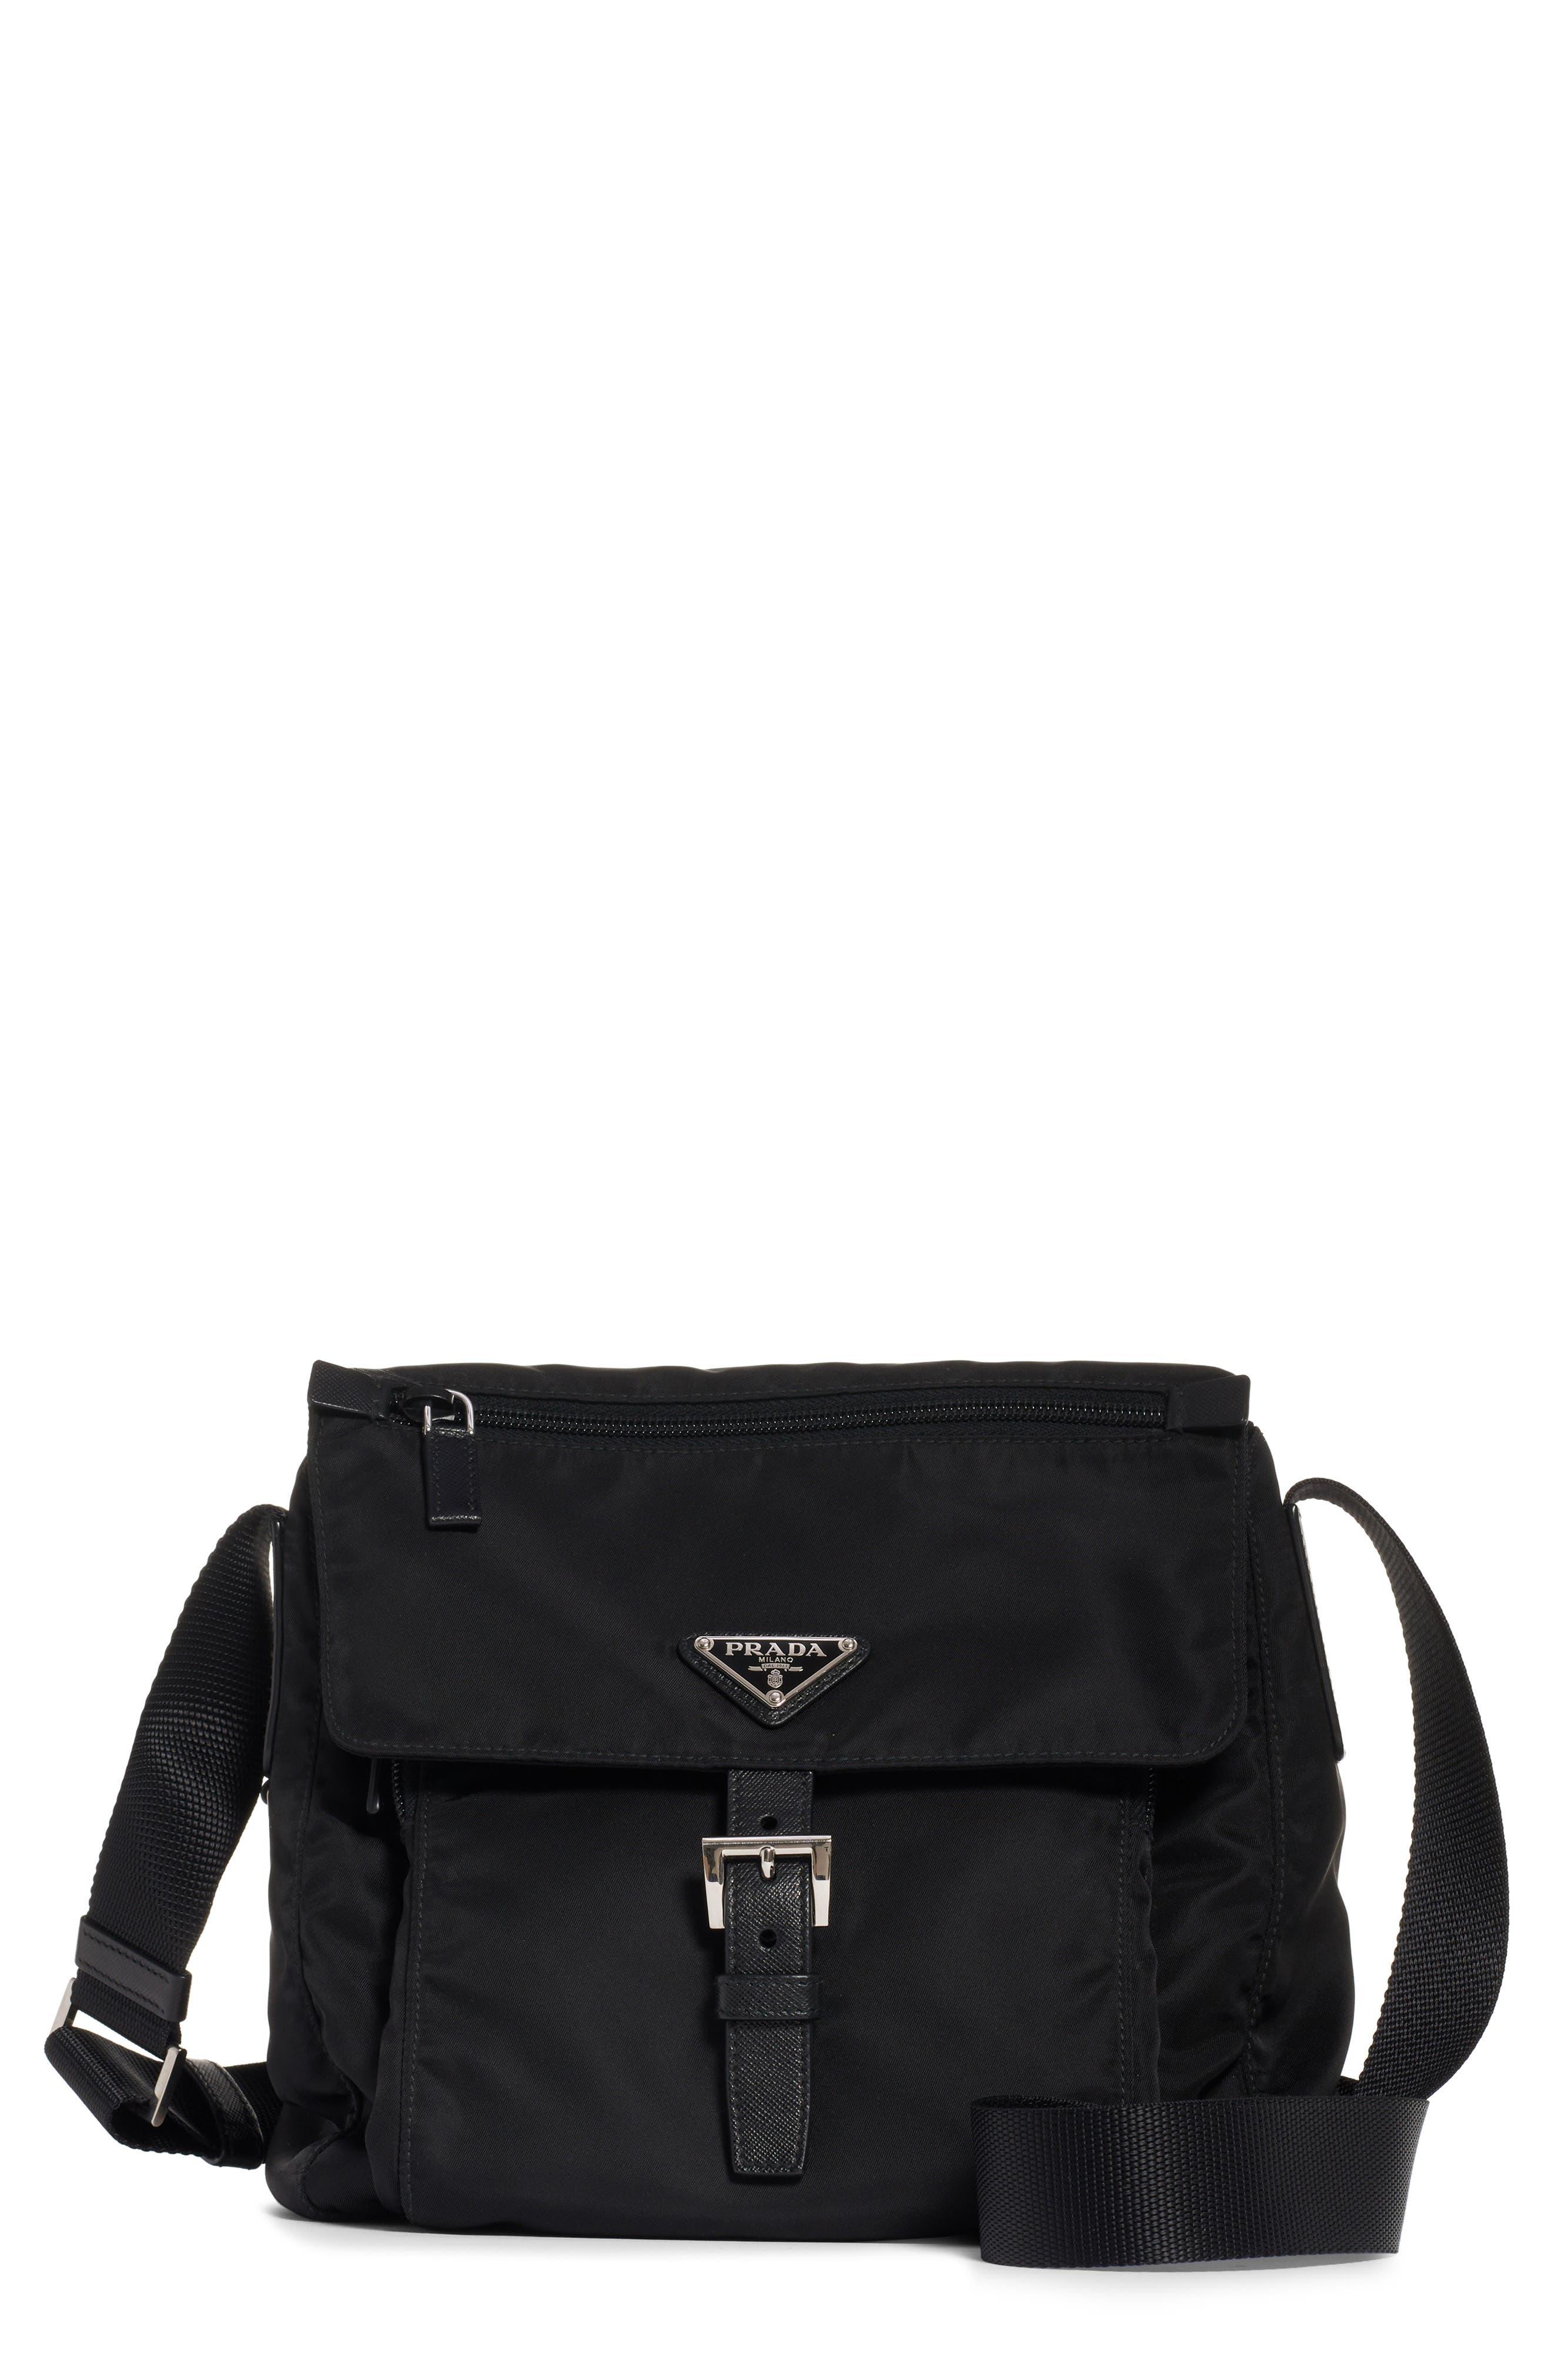 Vela Nylon Messenger Bag, Main, color, NERO